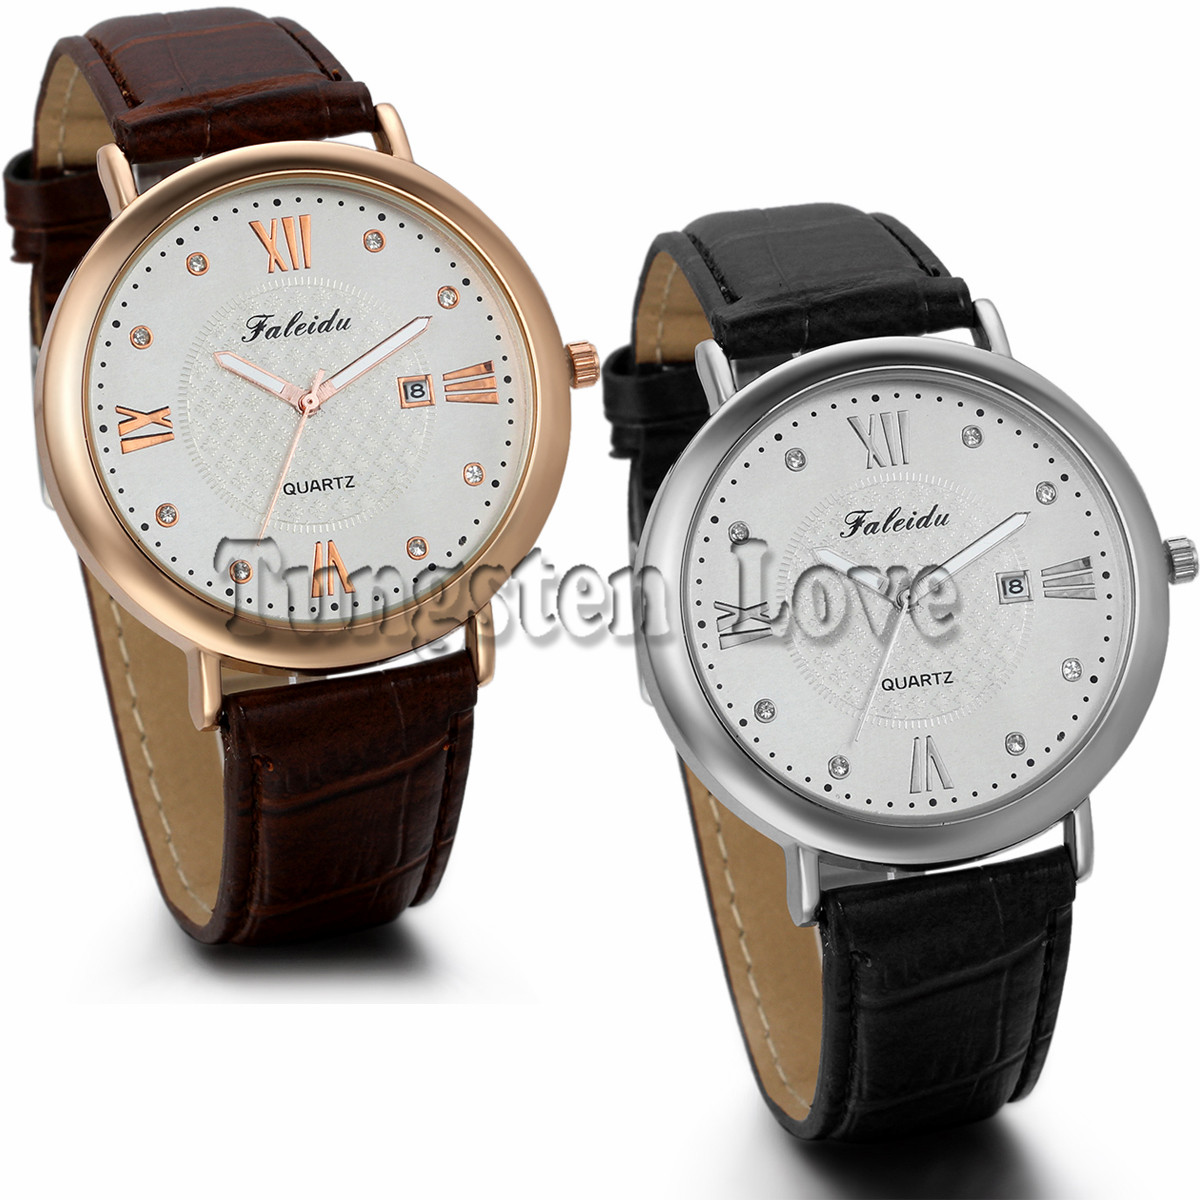 Luxury Watch Classic Quartz Men Watch Black Brown Leather Strap Analog Clock Men Casual Watch montre homme(China (Mainland))